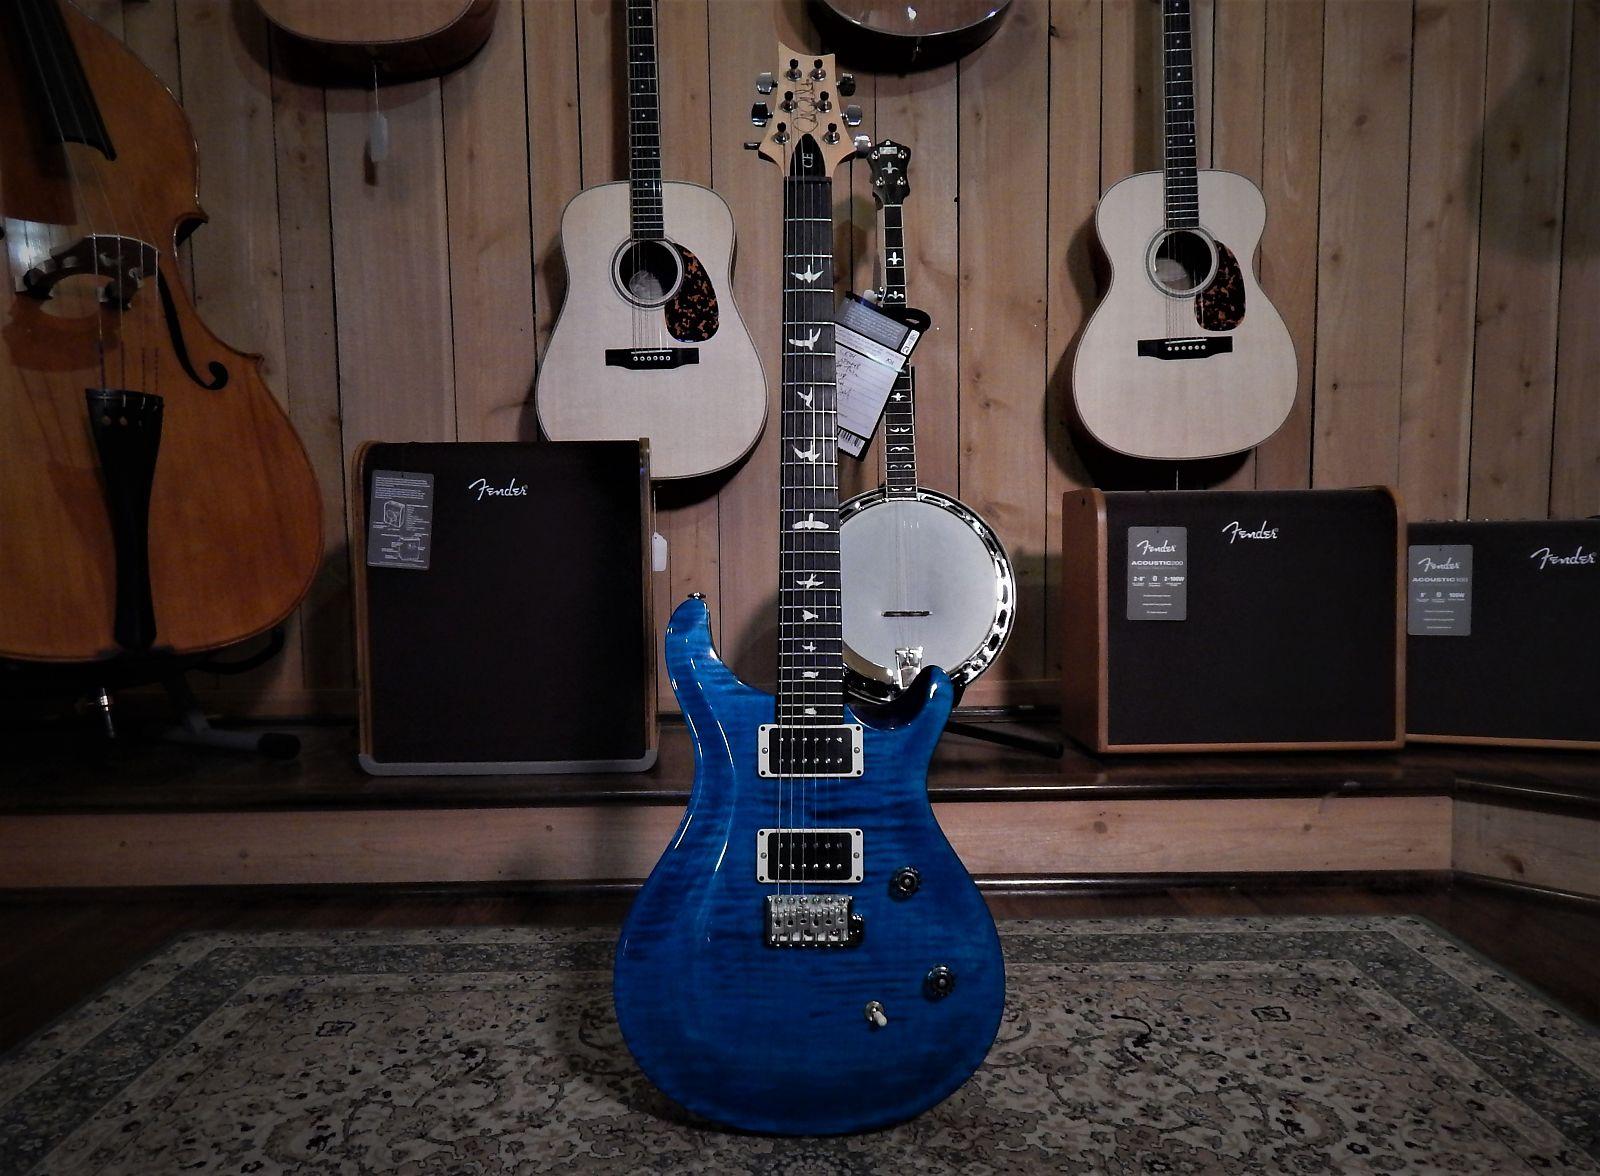 Paul Reed Smith CE-24 CC Blue Matteo (Rare Color) 2018